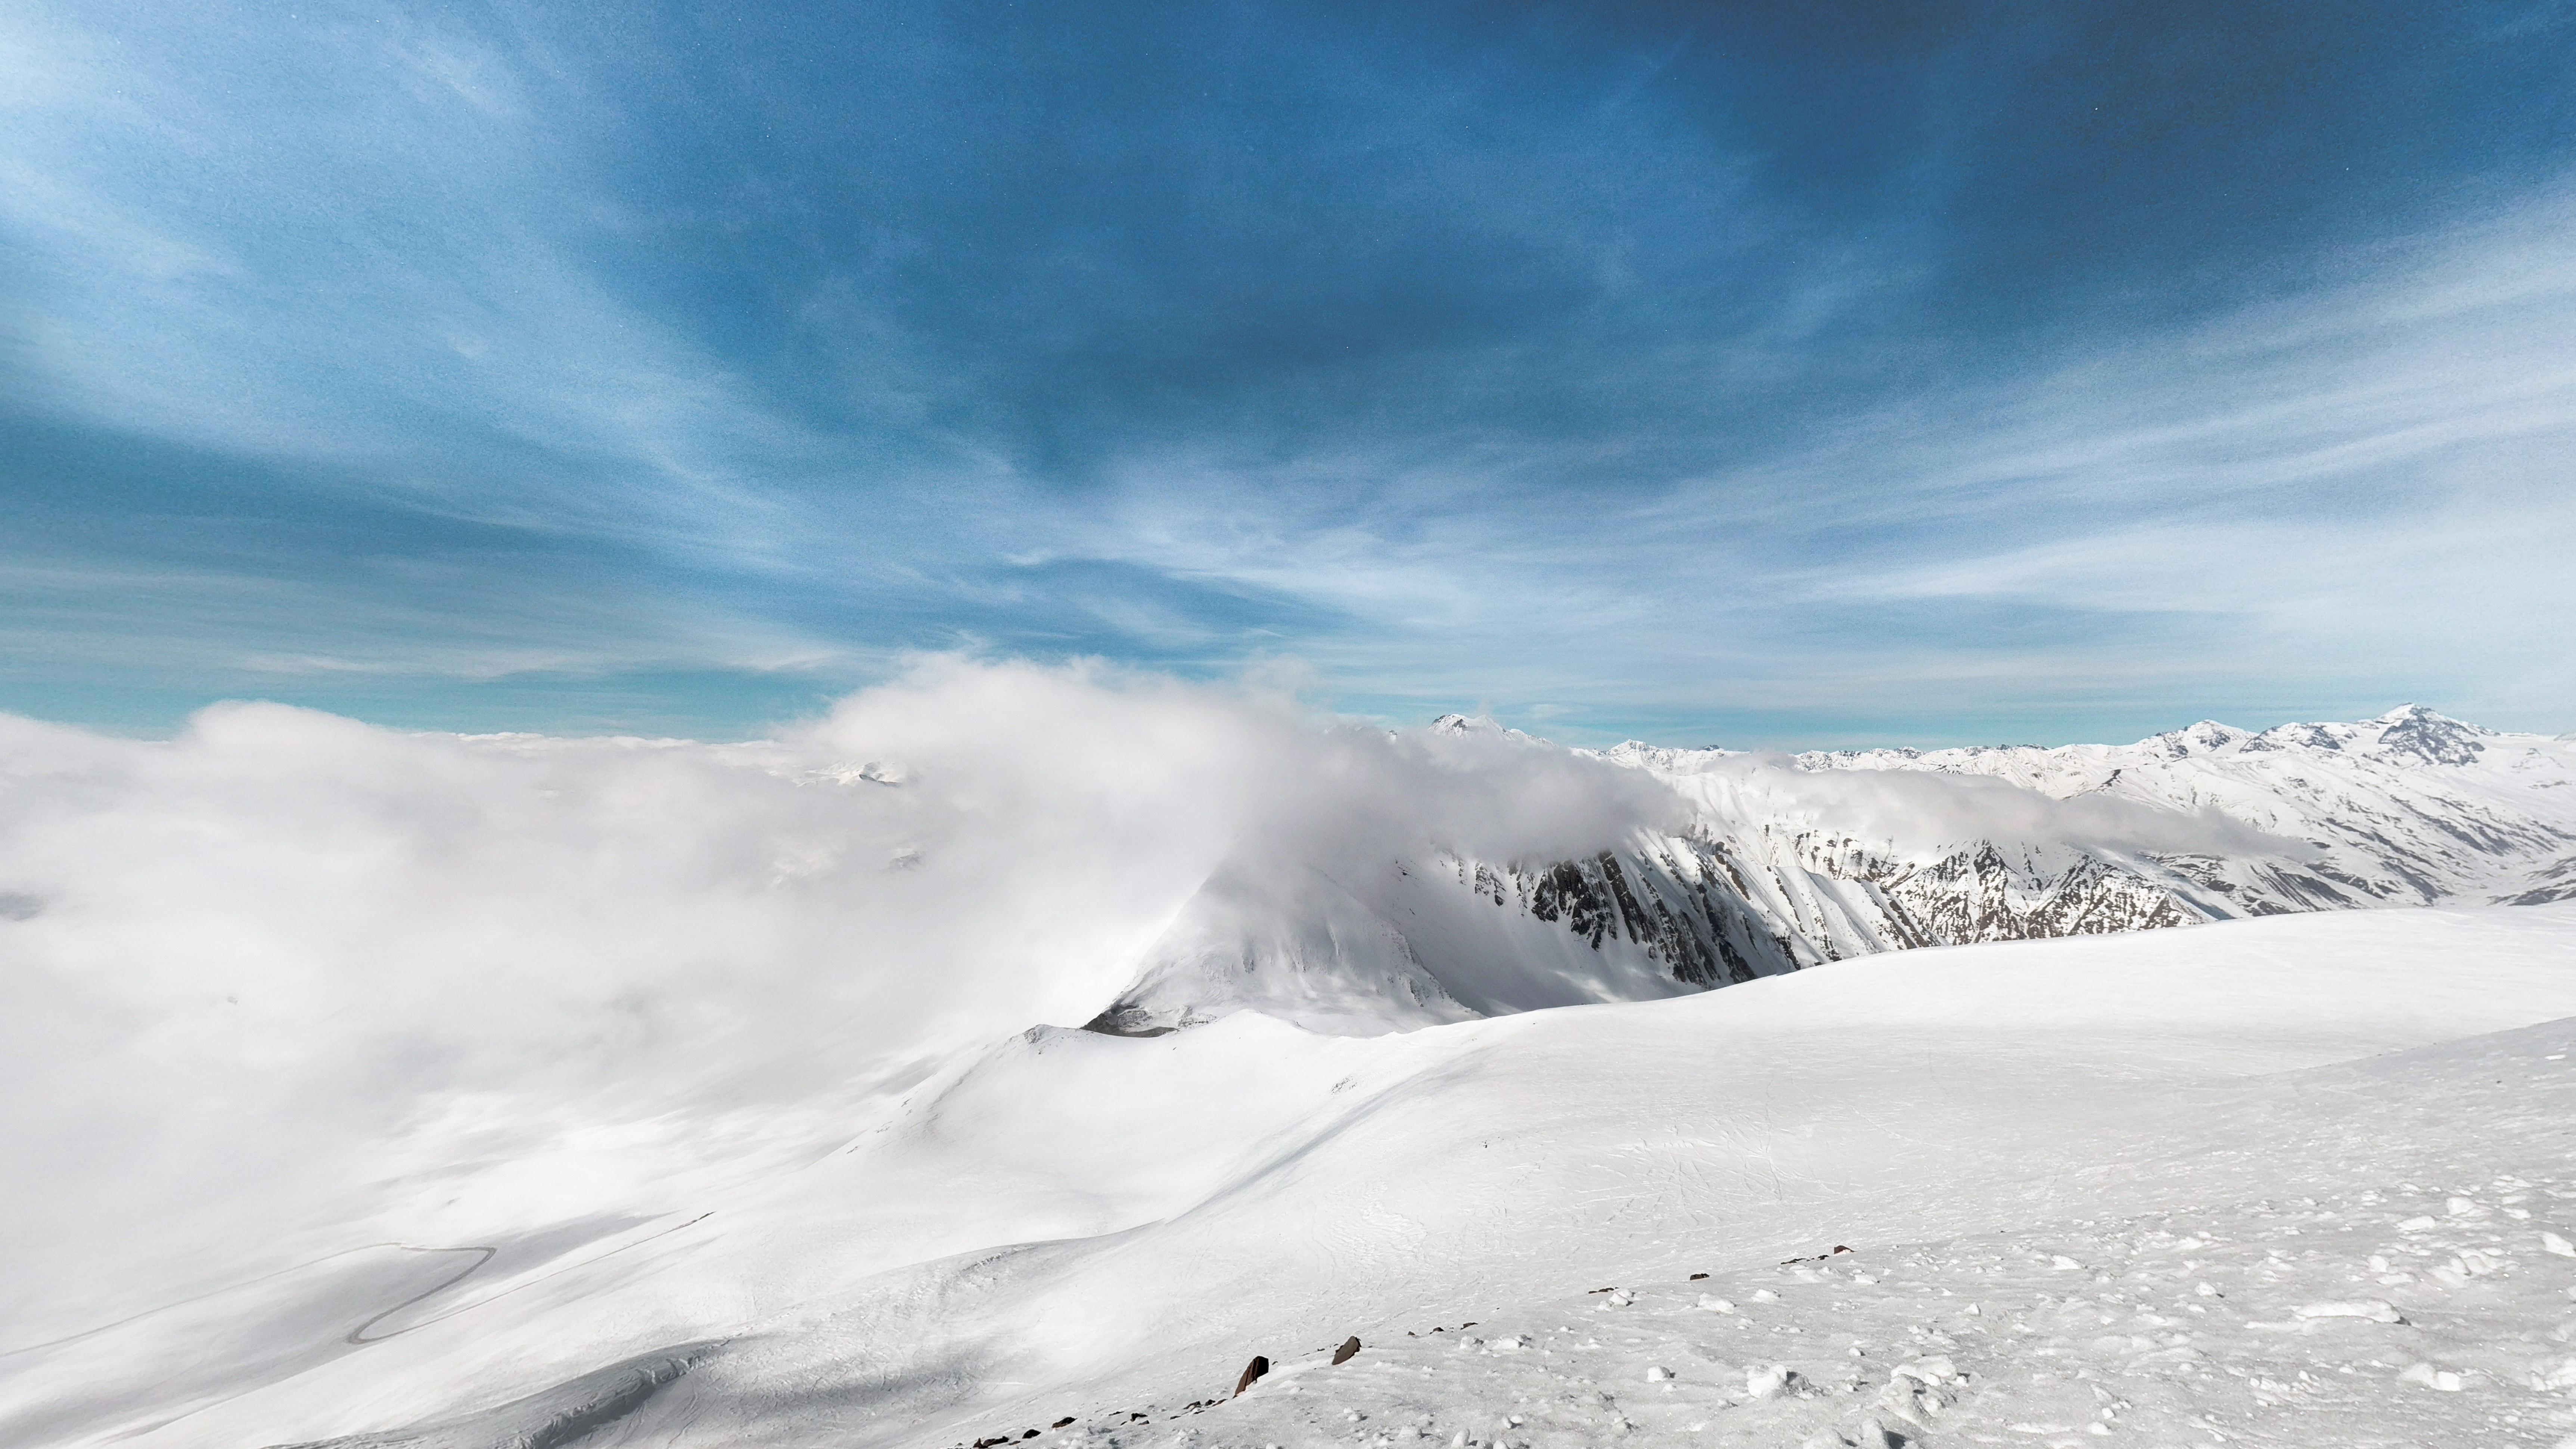 smoking snow-covered mountain